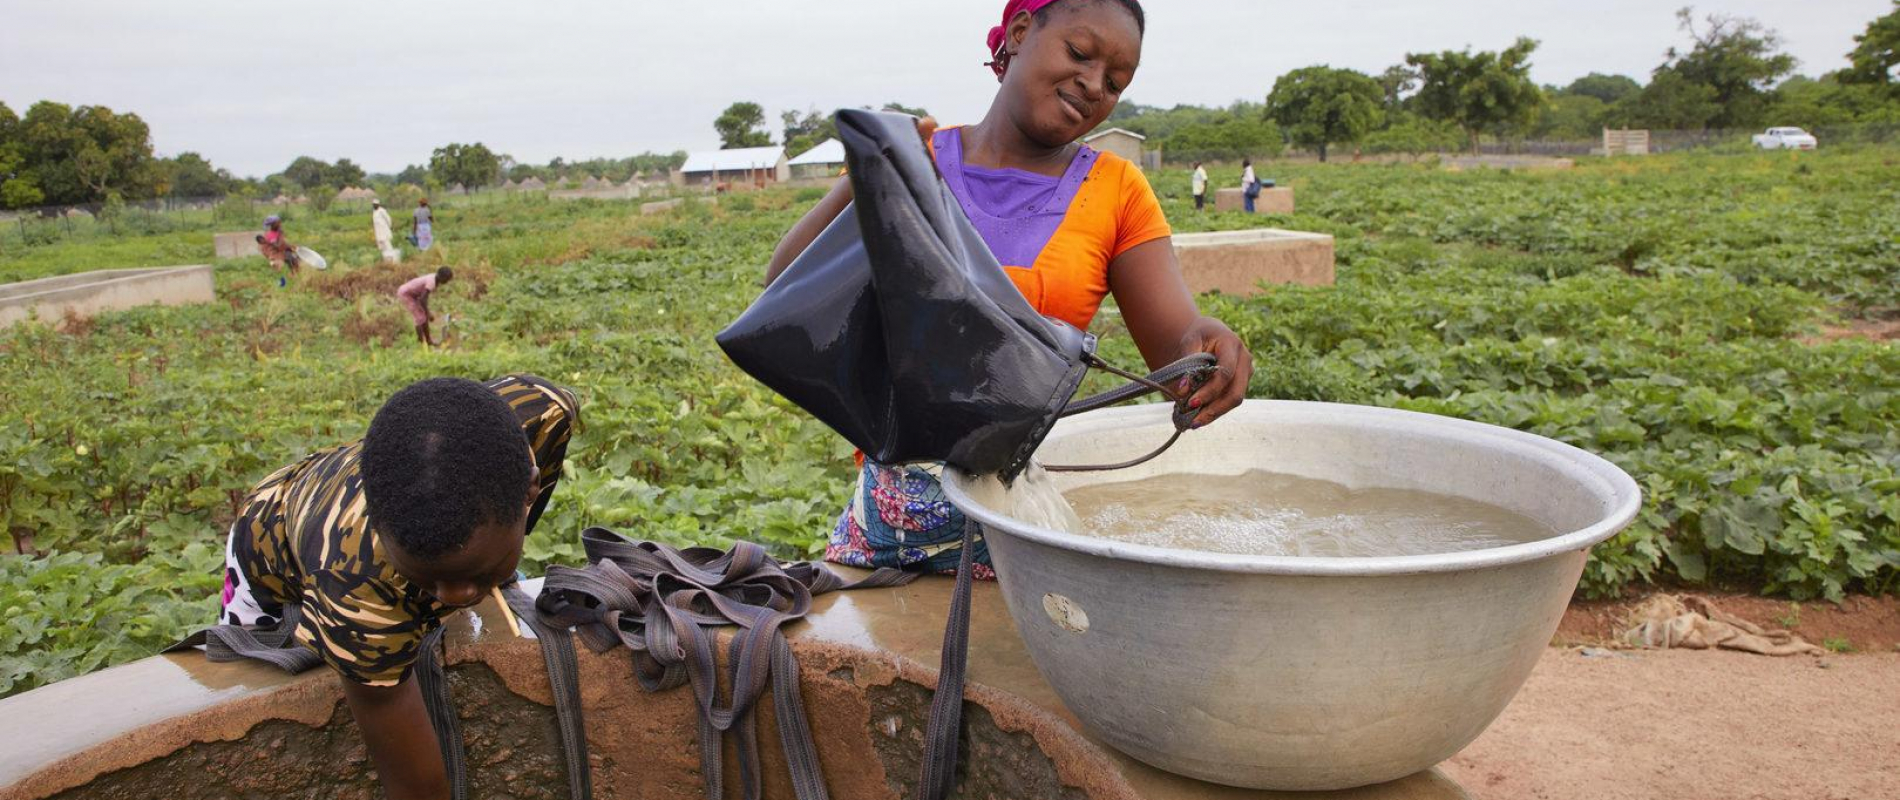 Benin SinendeJacqueline Kora (22) oranje  Tuin van Gnangbannou met waterpomp Dedras 23-6-2018 foto Jaco Klamer